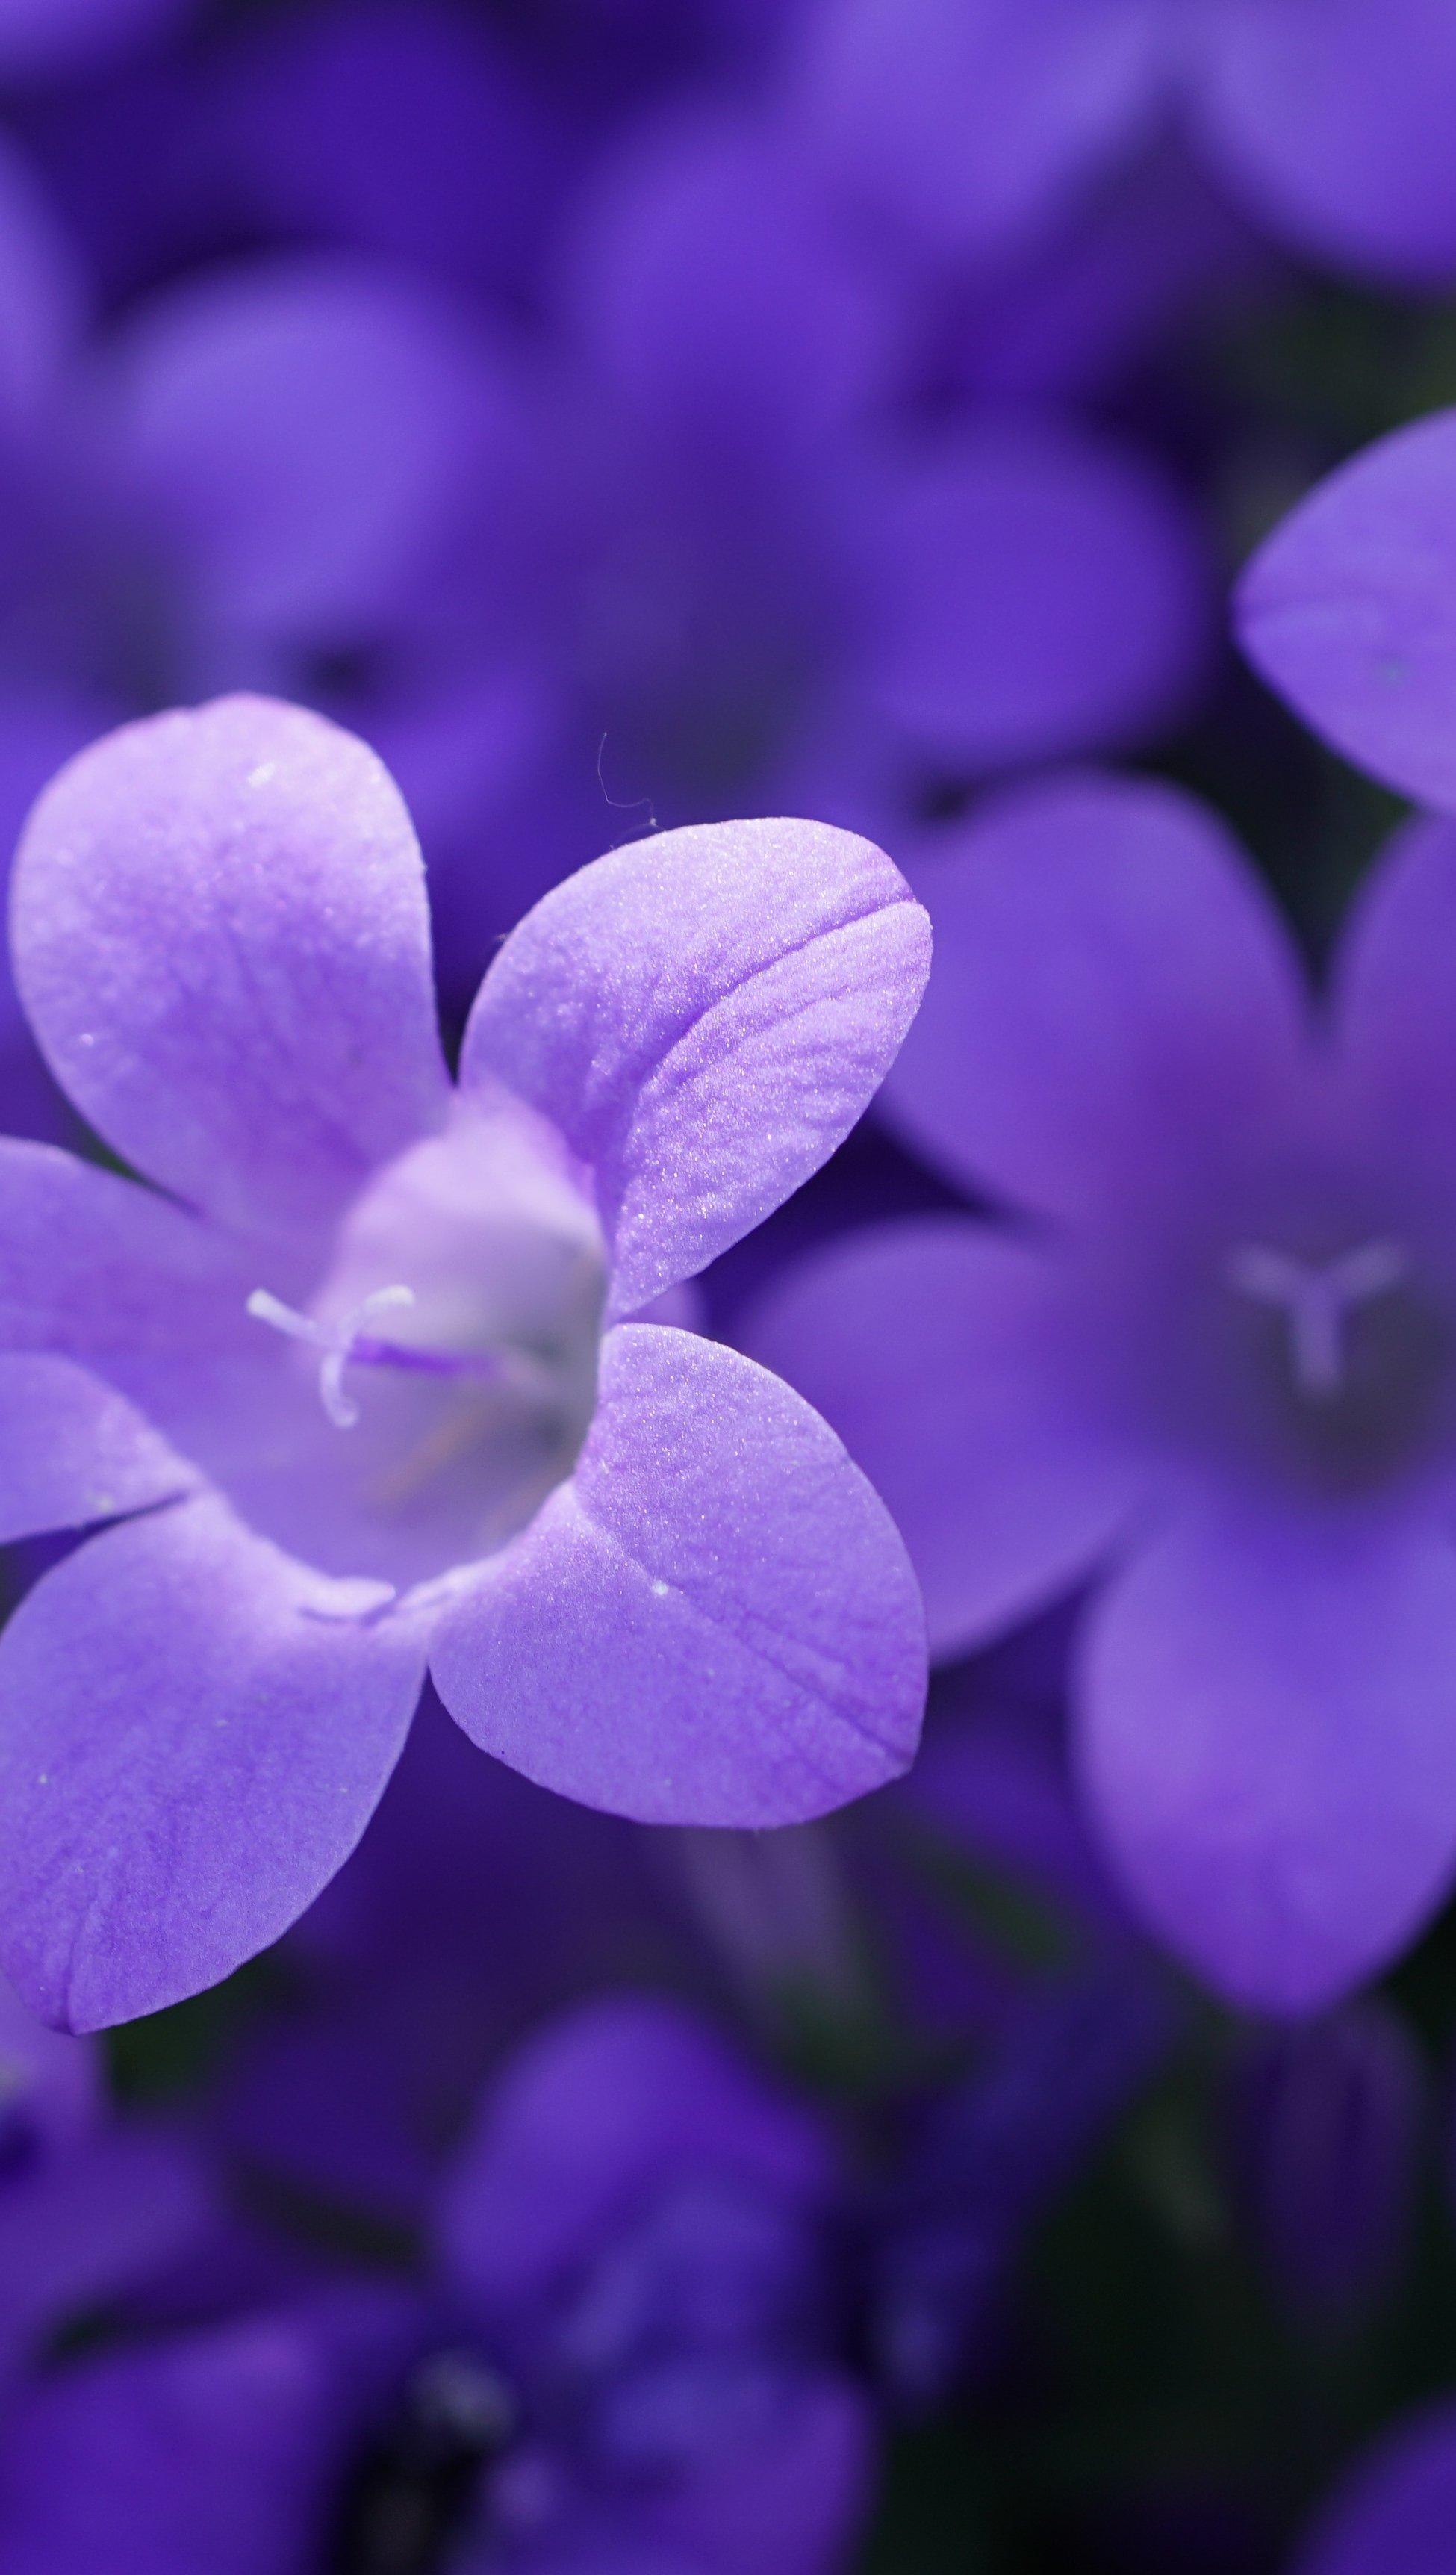 Fondos de pantalla Violetas Vertical